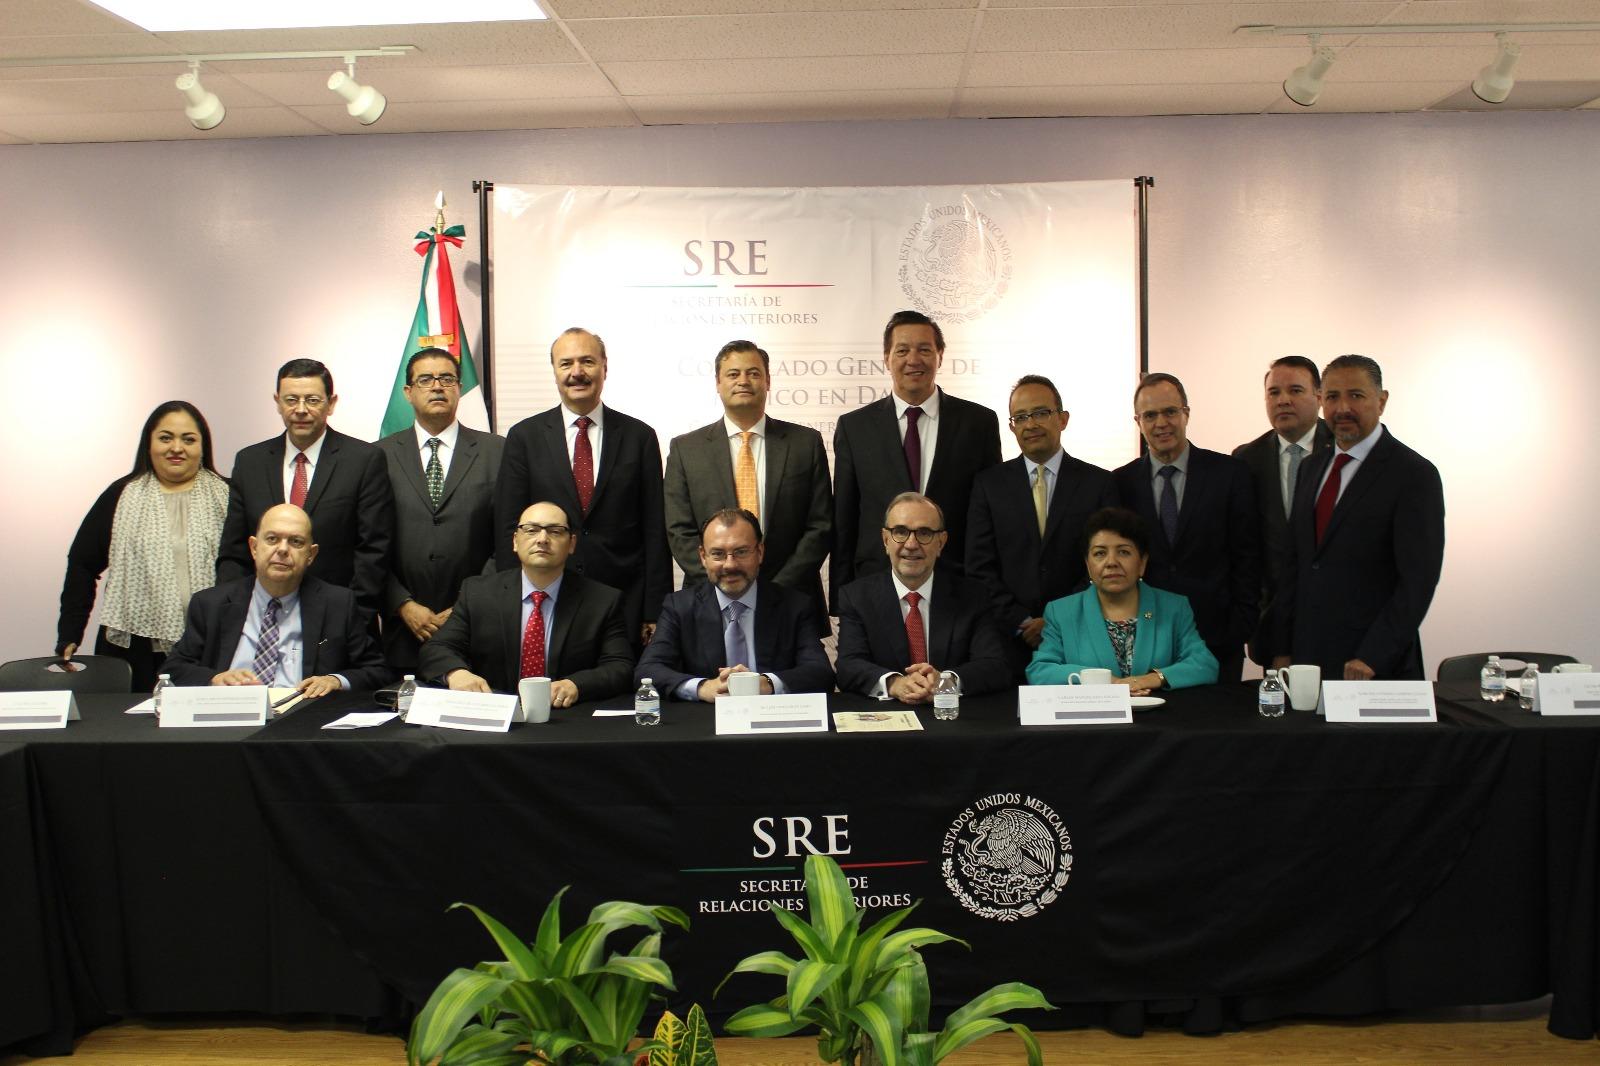 Aa- Se reúne el Canciller Luis Videgaray Caso con los Cónsules de México en Texas